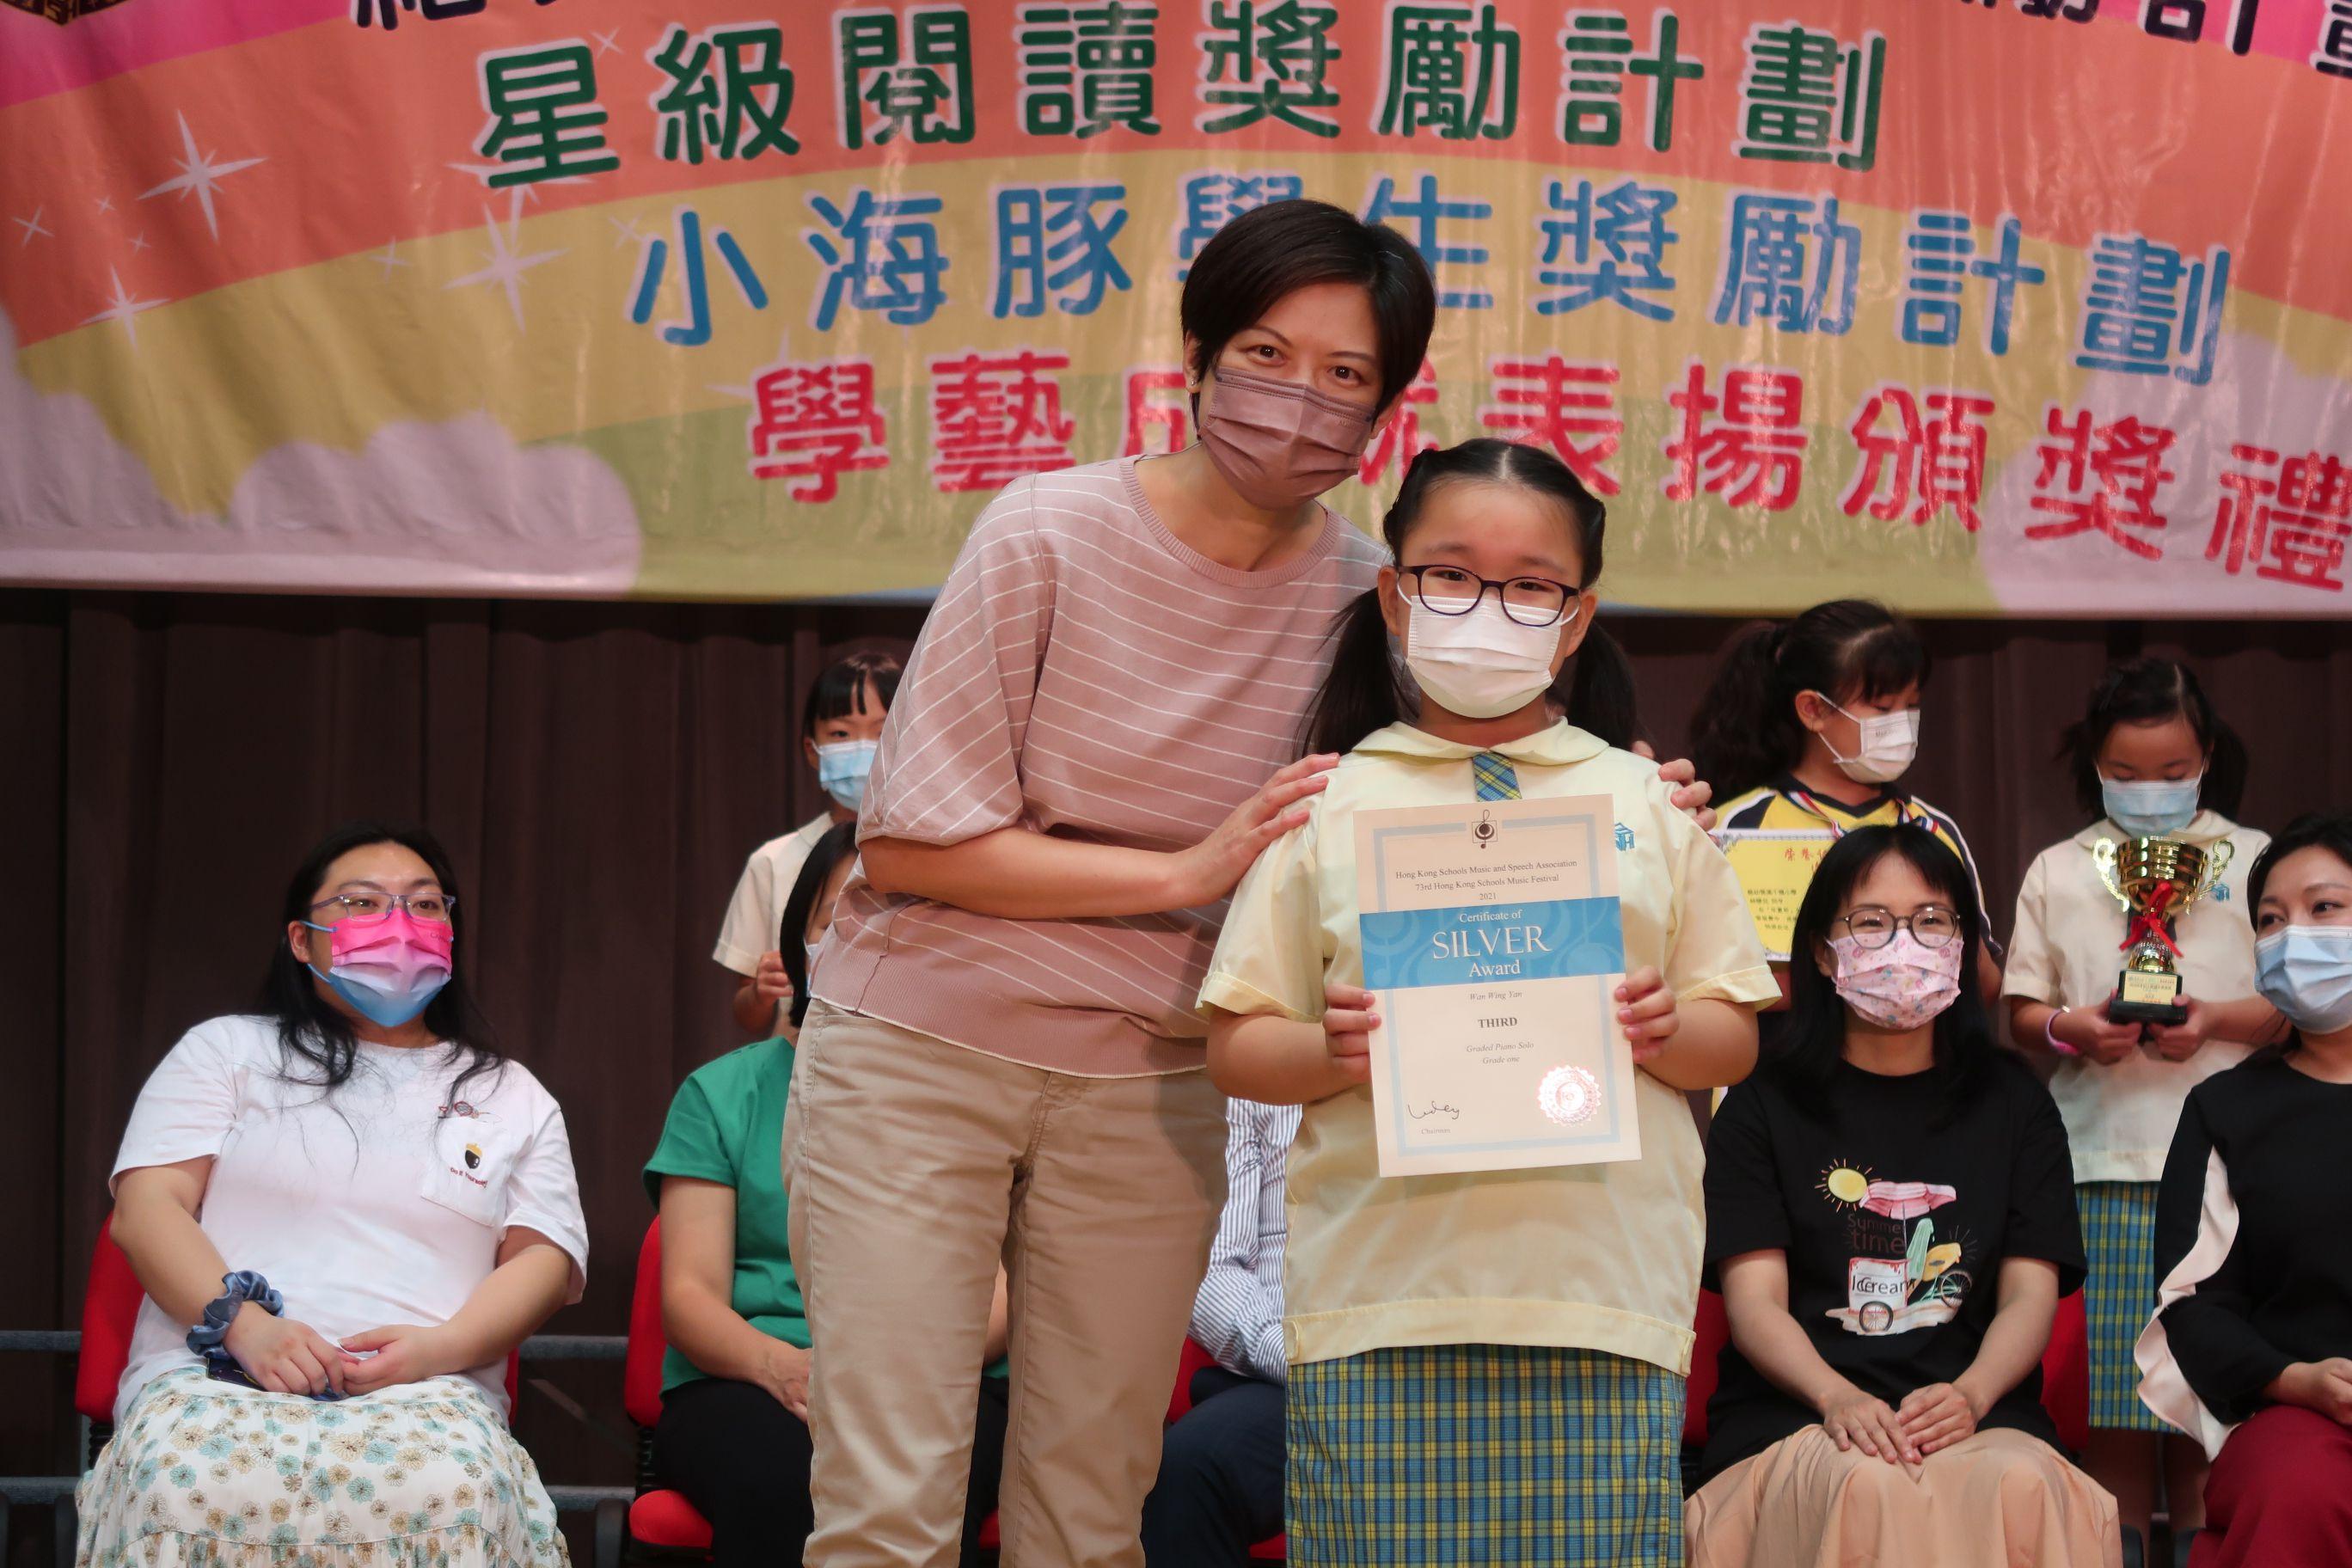 https://syh.edu.hk/sites/default/files/img_5924.jpg